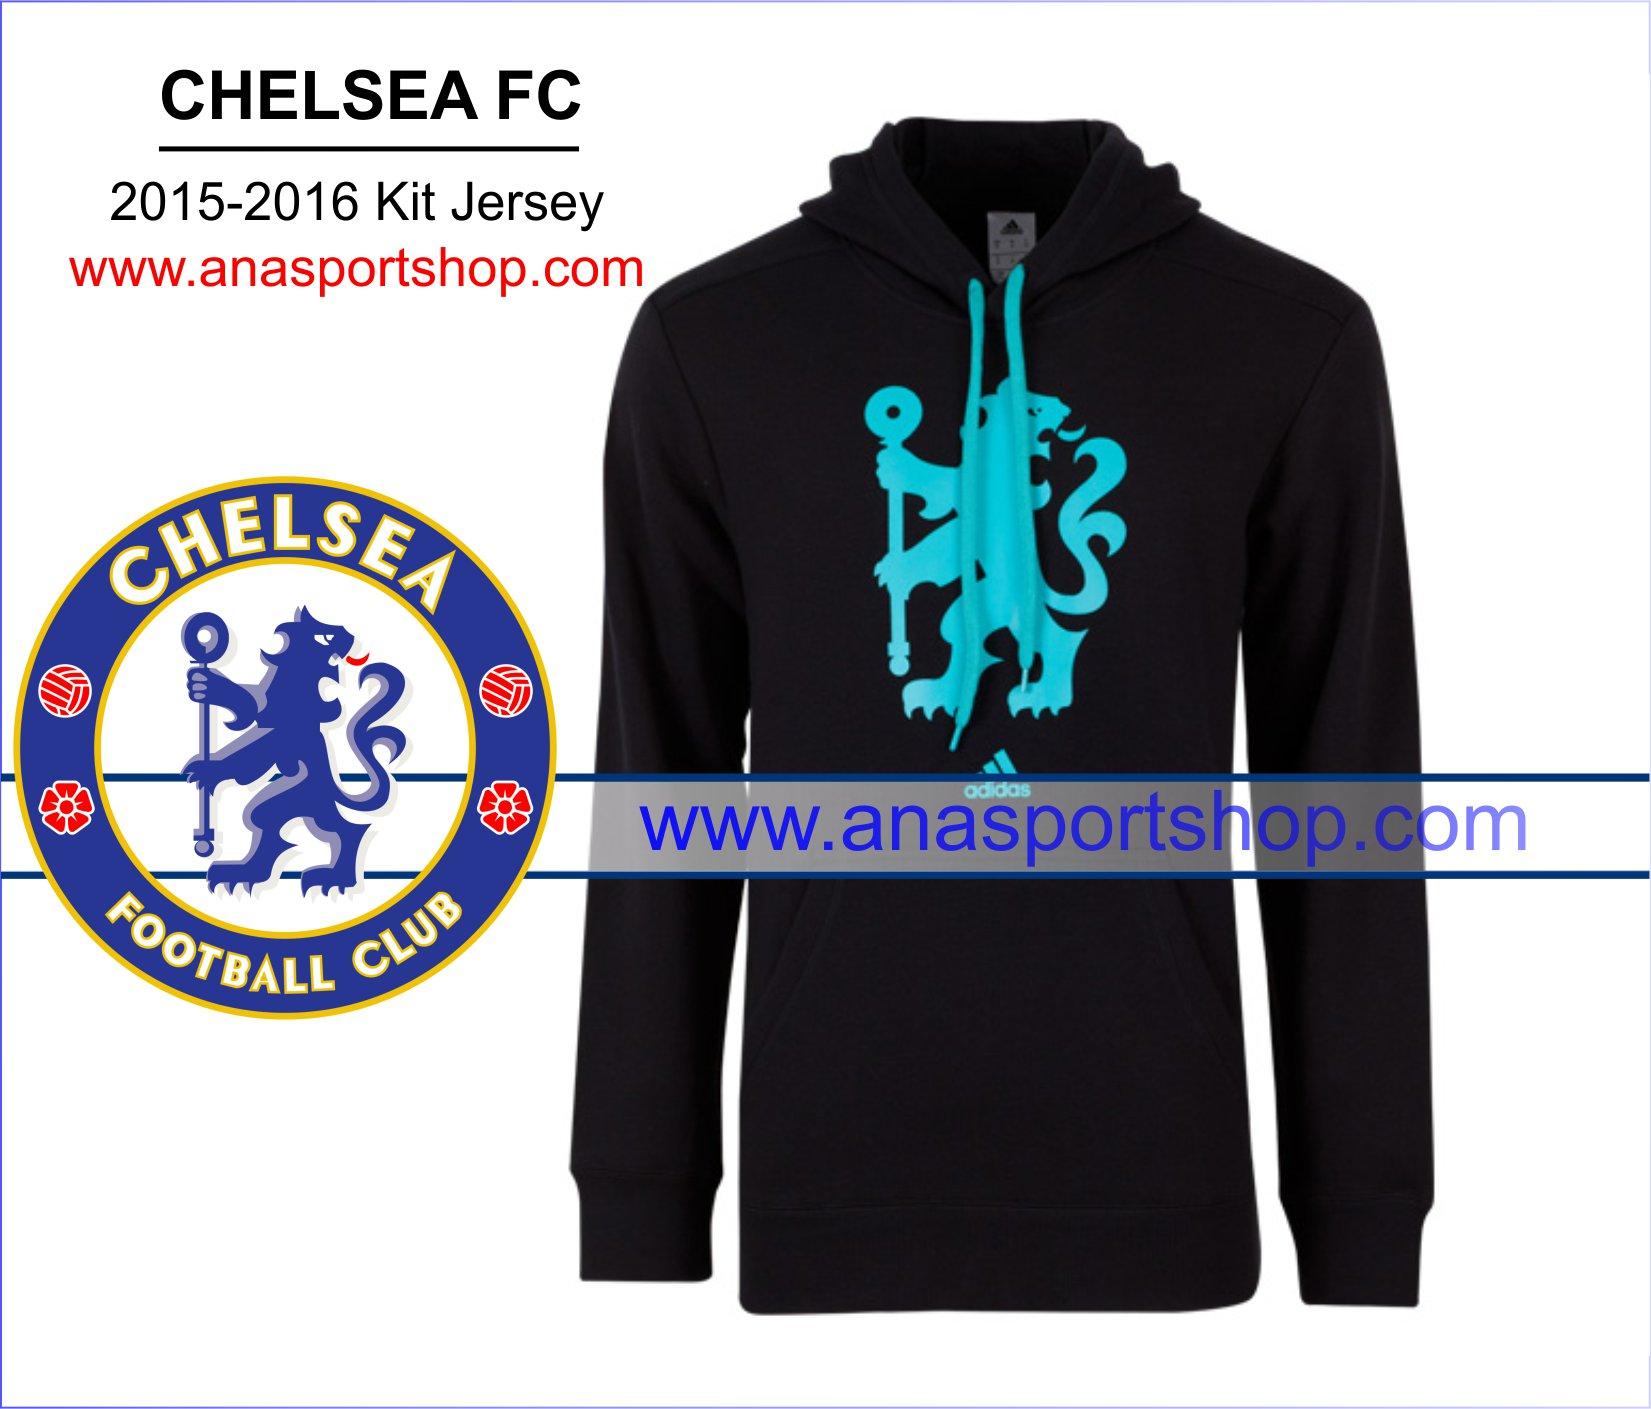 Áo khoác Chelsea 2015-2016